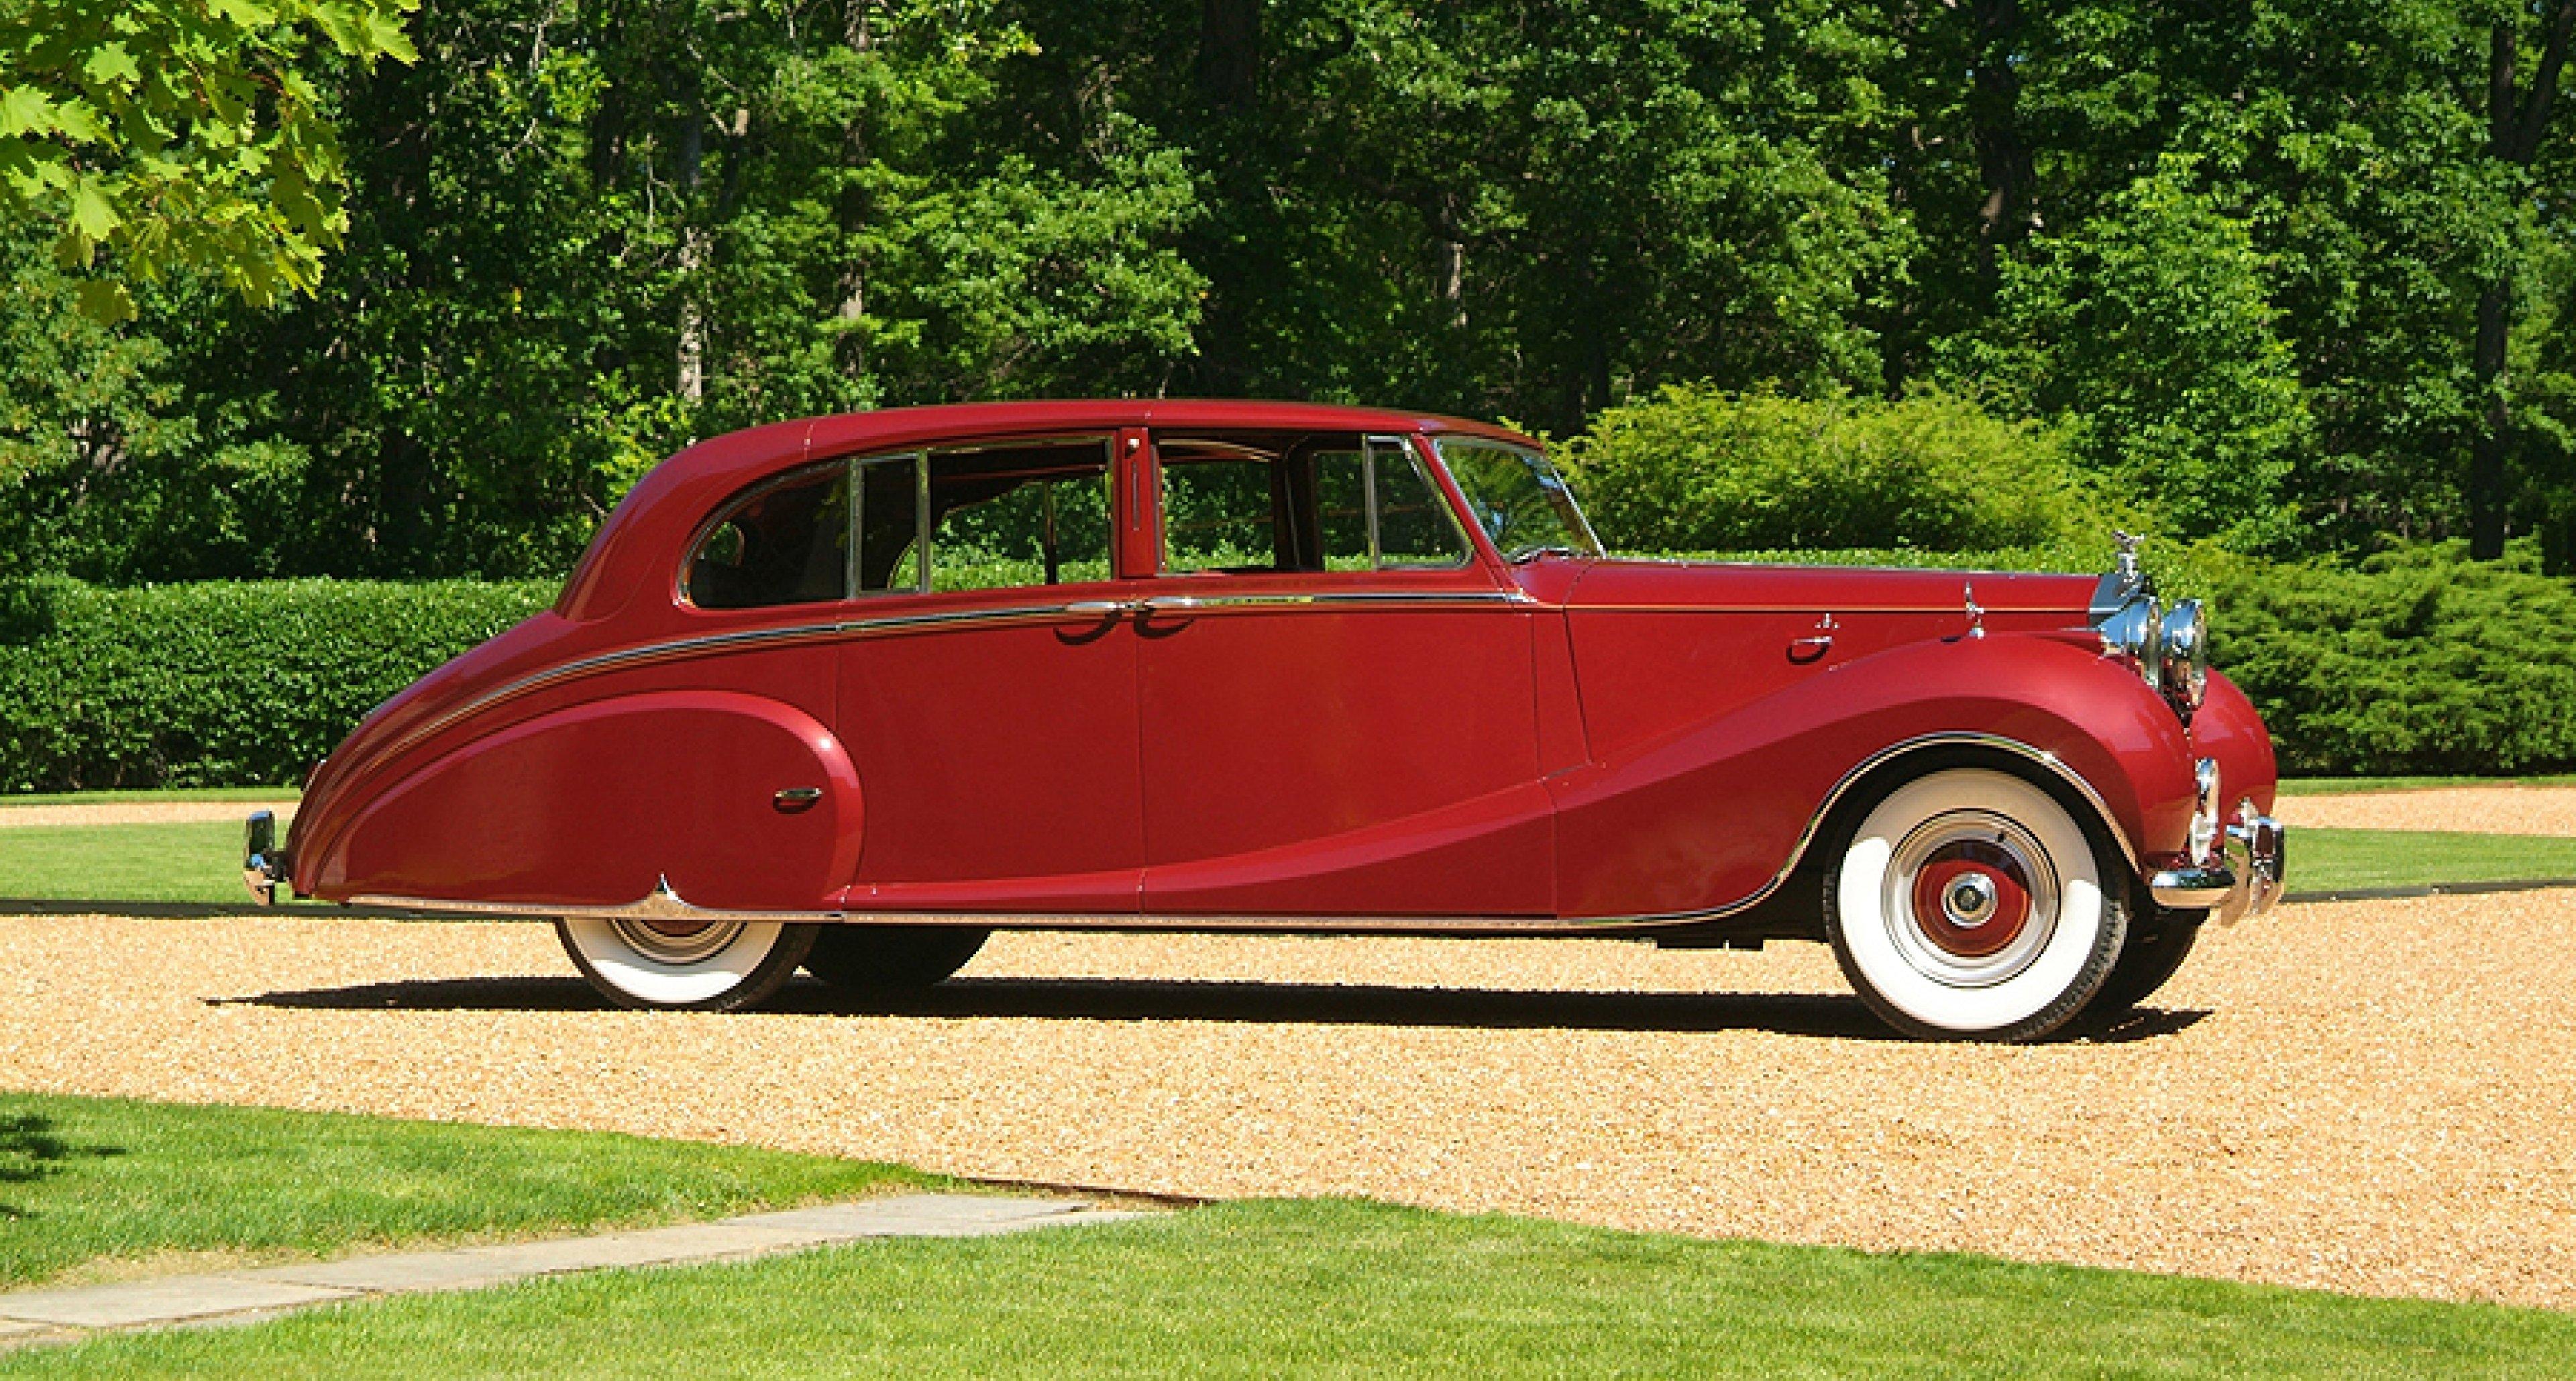 Gooding versteigert Aga Khans Rolls-Royce Phantom IV Sedanca de Ville